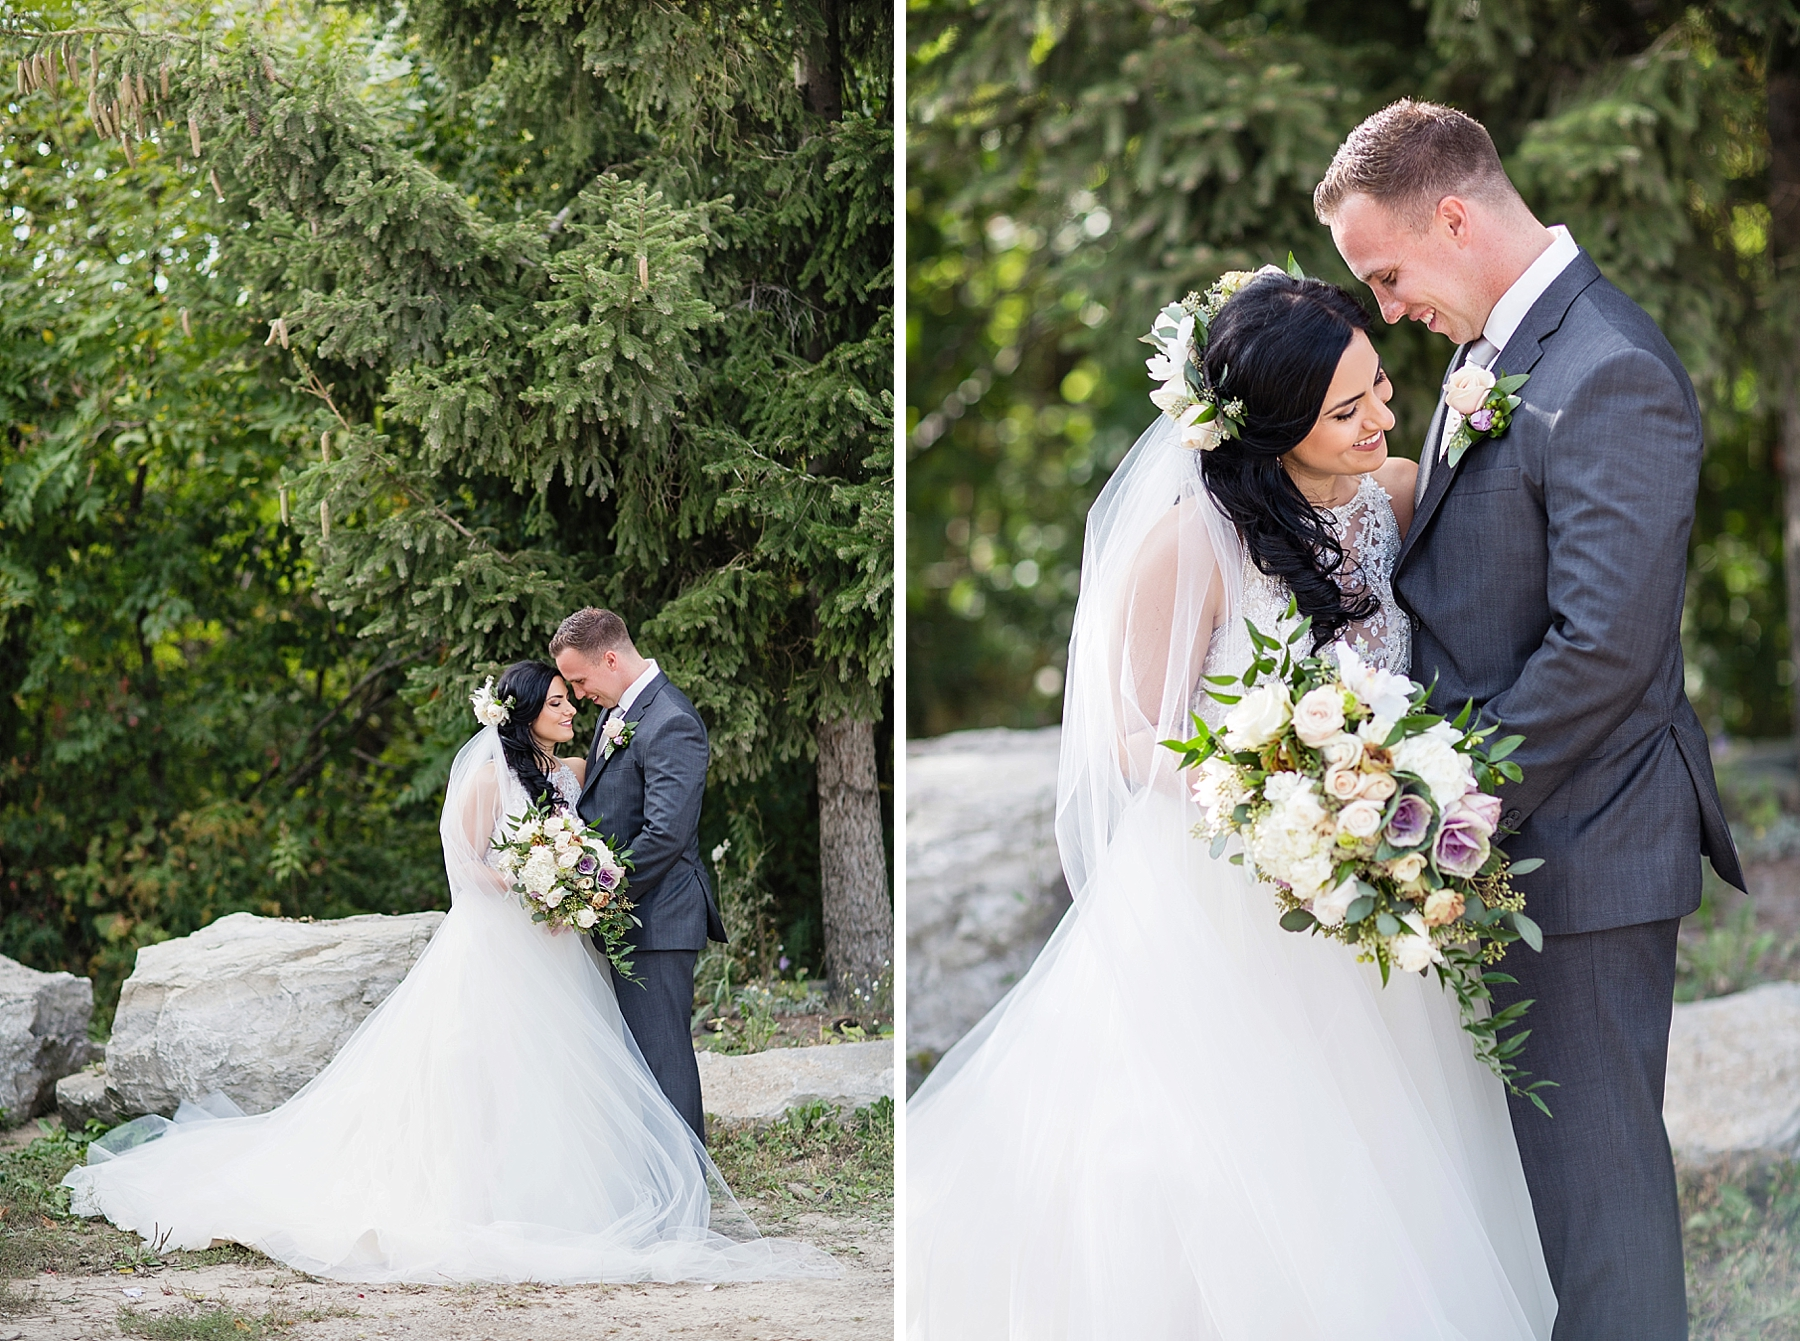 windsor-wedding-photographer-sprucewood-shores-winery-wedding-niagara-on-the-lake-wedding-photographer-eryn-shea-photography_0032.jpg